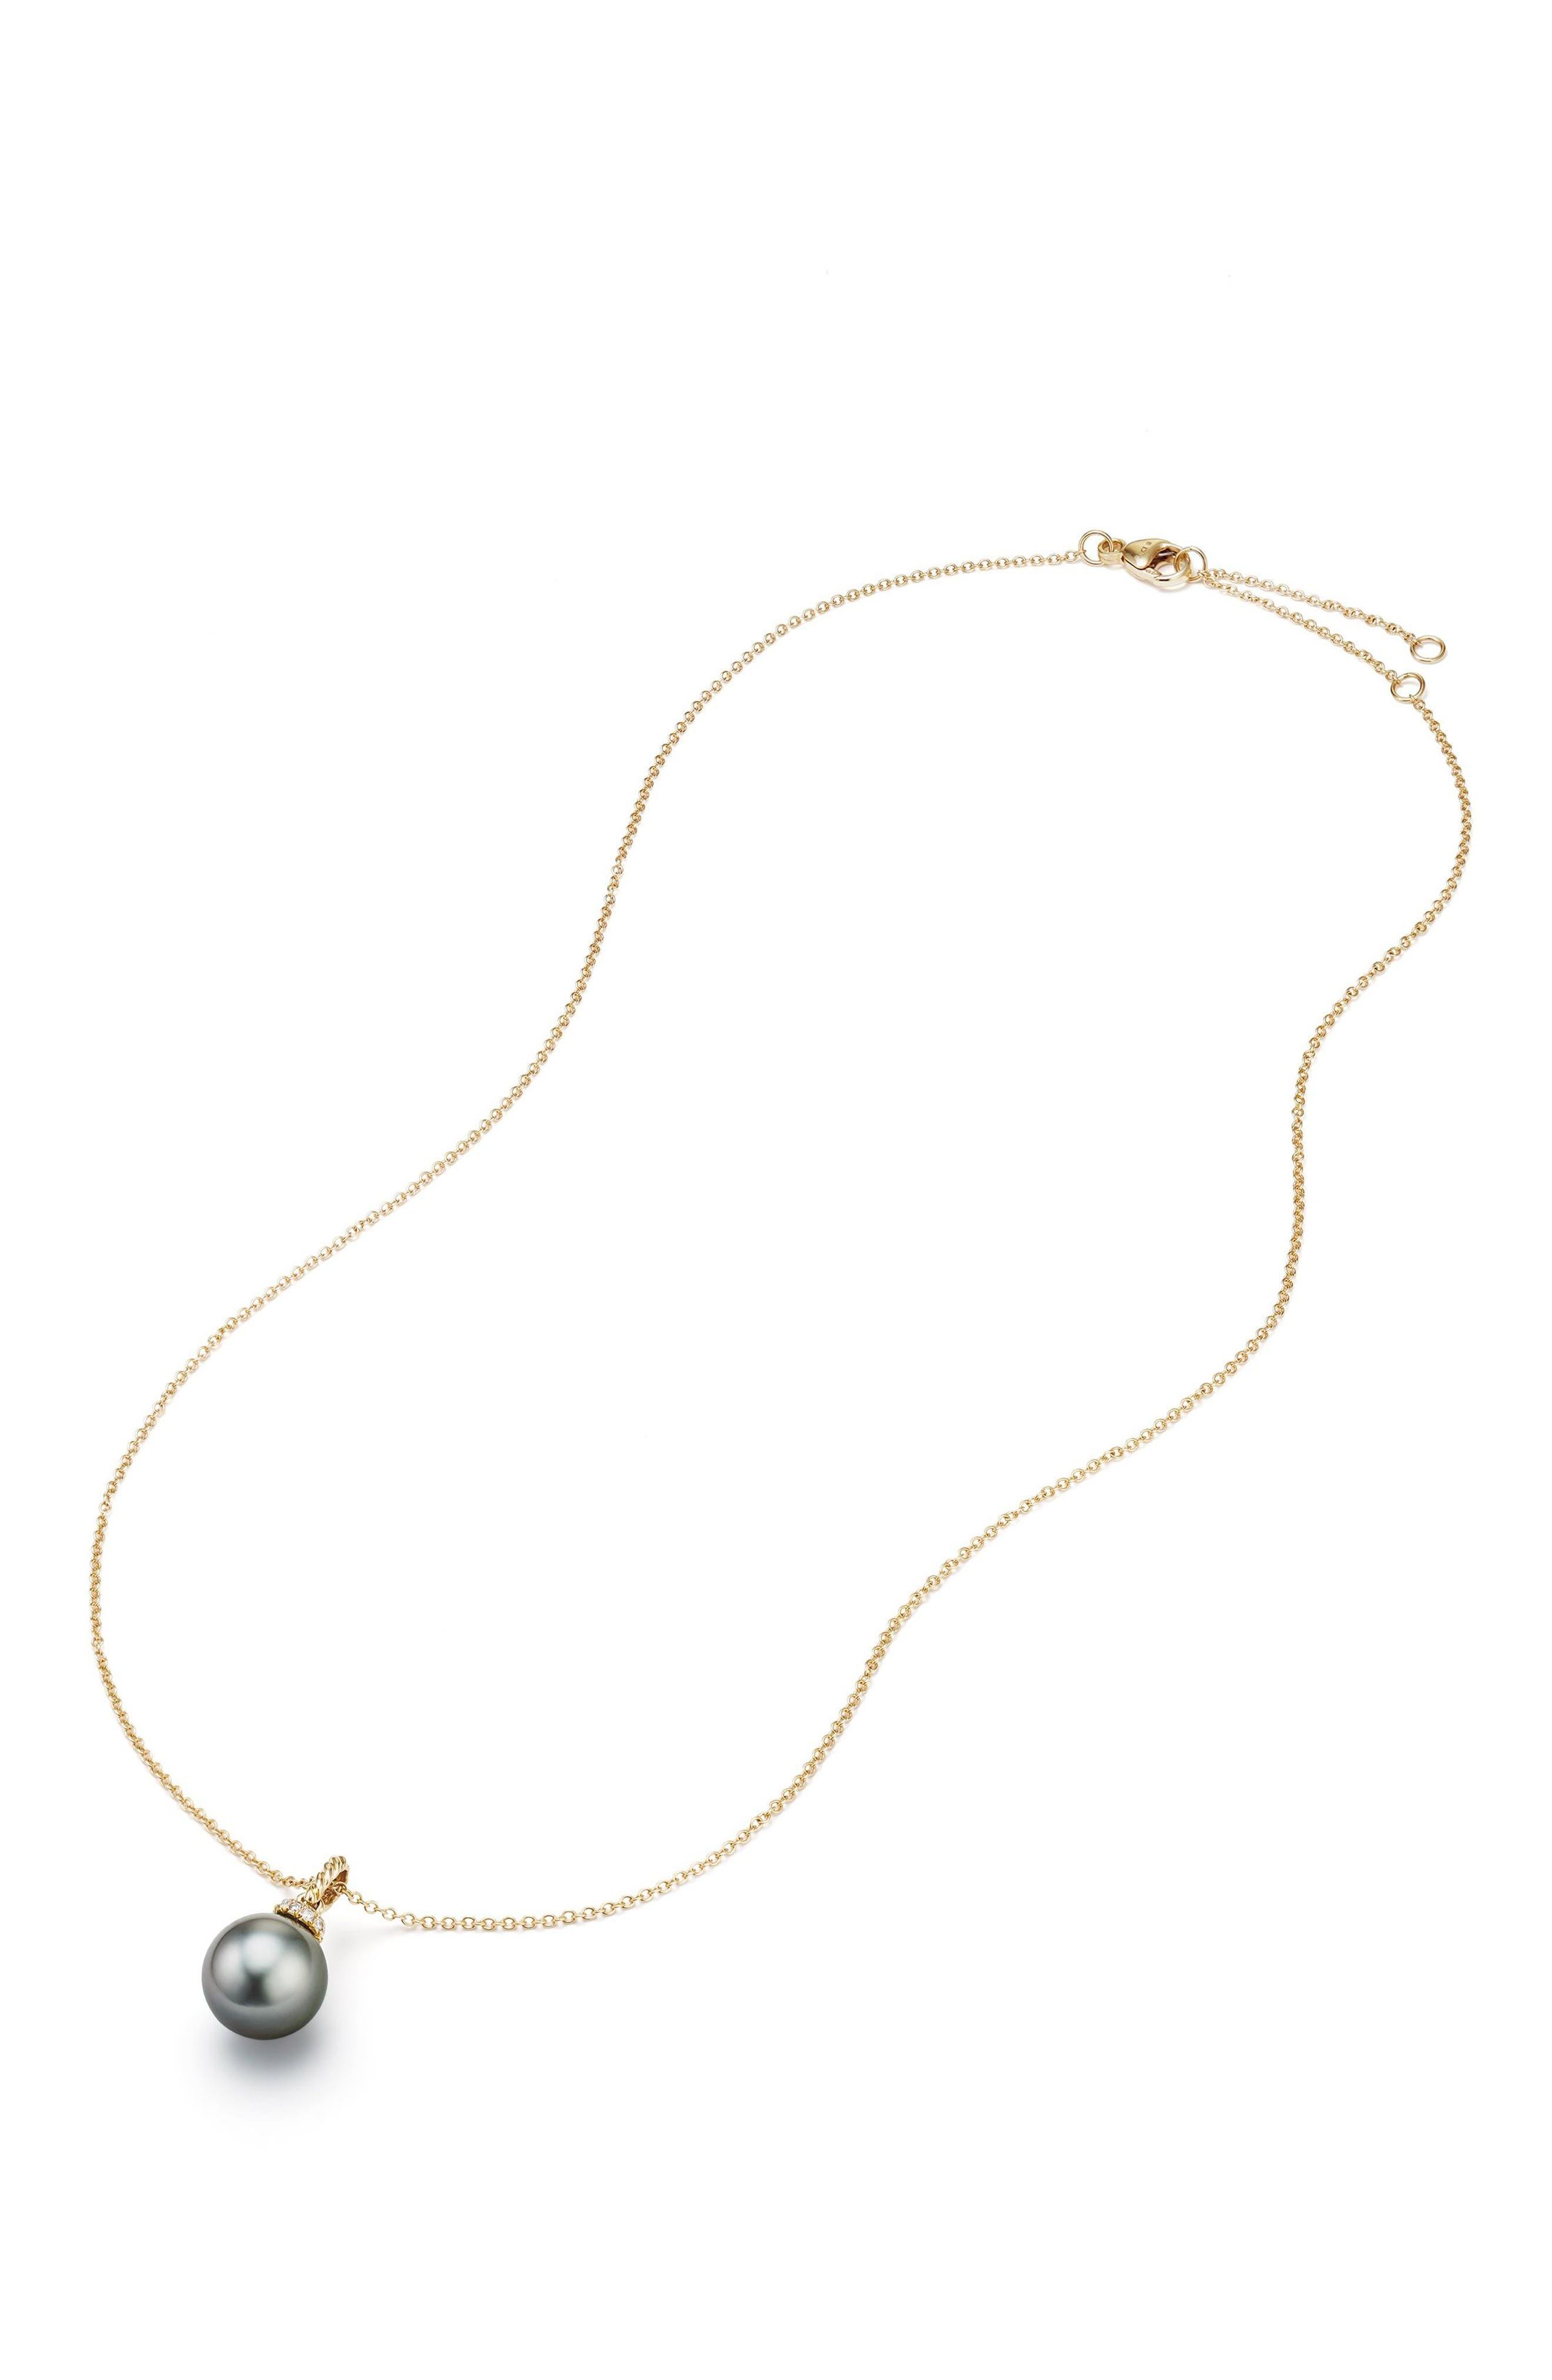 Solari Pendant Necklace with Diamonds,                             Alternate thumbnail 2, color,                             GOLD/ DIAMOND/ GREY PEARL